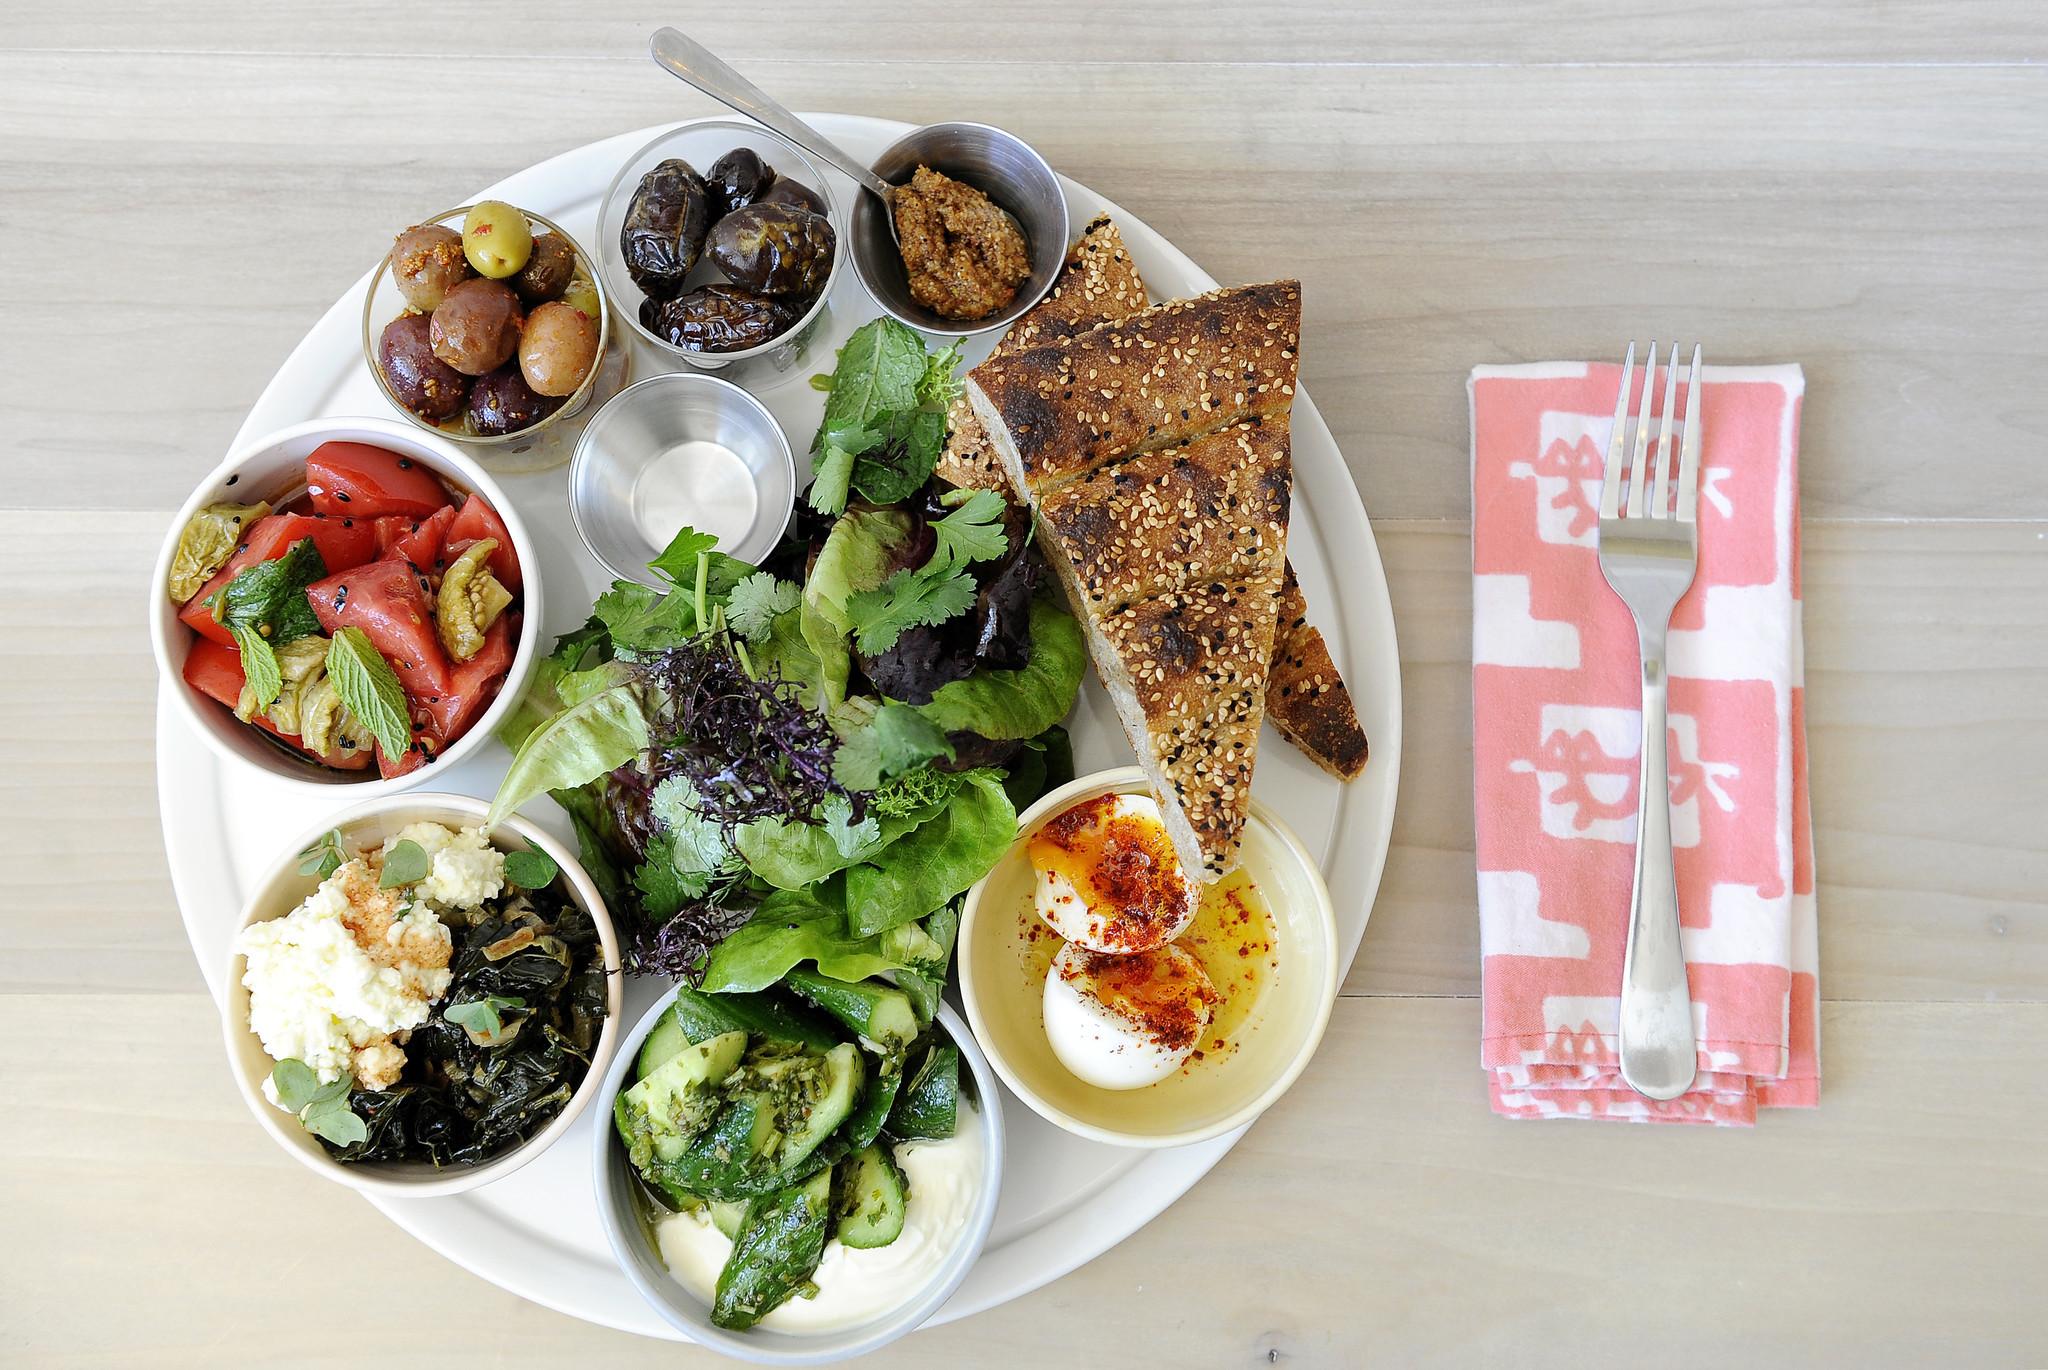 LOS FELIZ, CA- April 21, 2017: The Turk-ish Breakfast at Kismeton Friday, April 21, 2017. (Mariah Ta